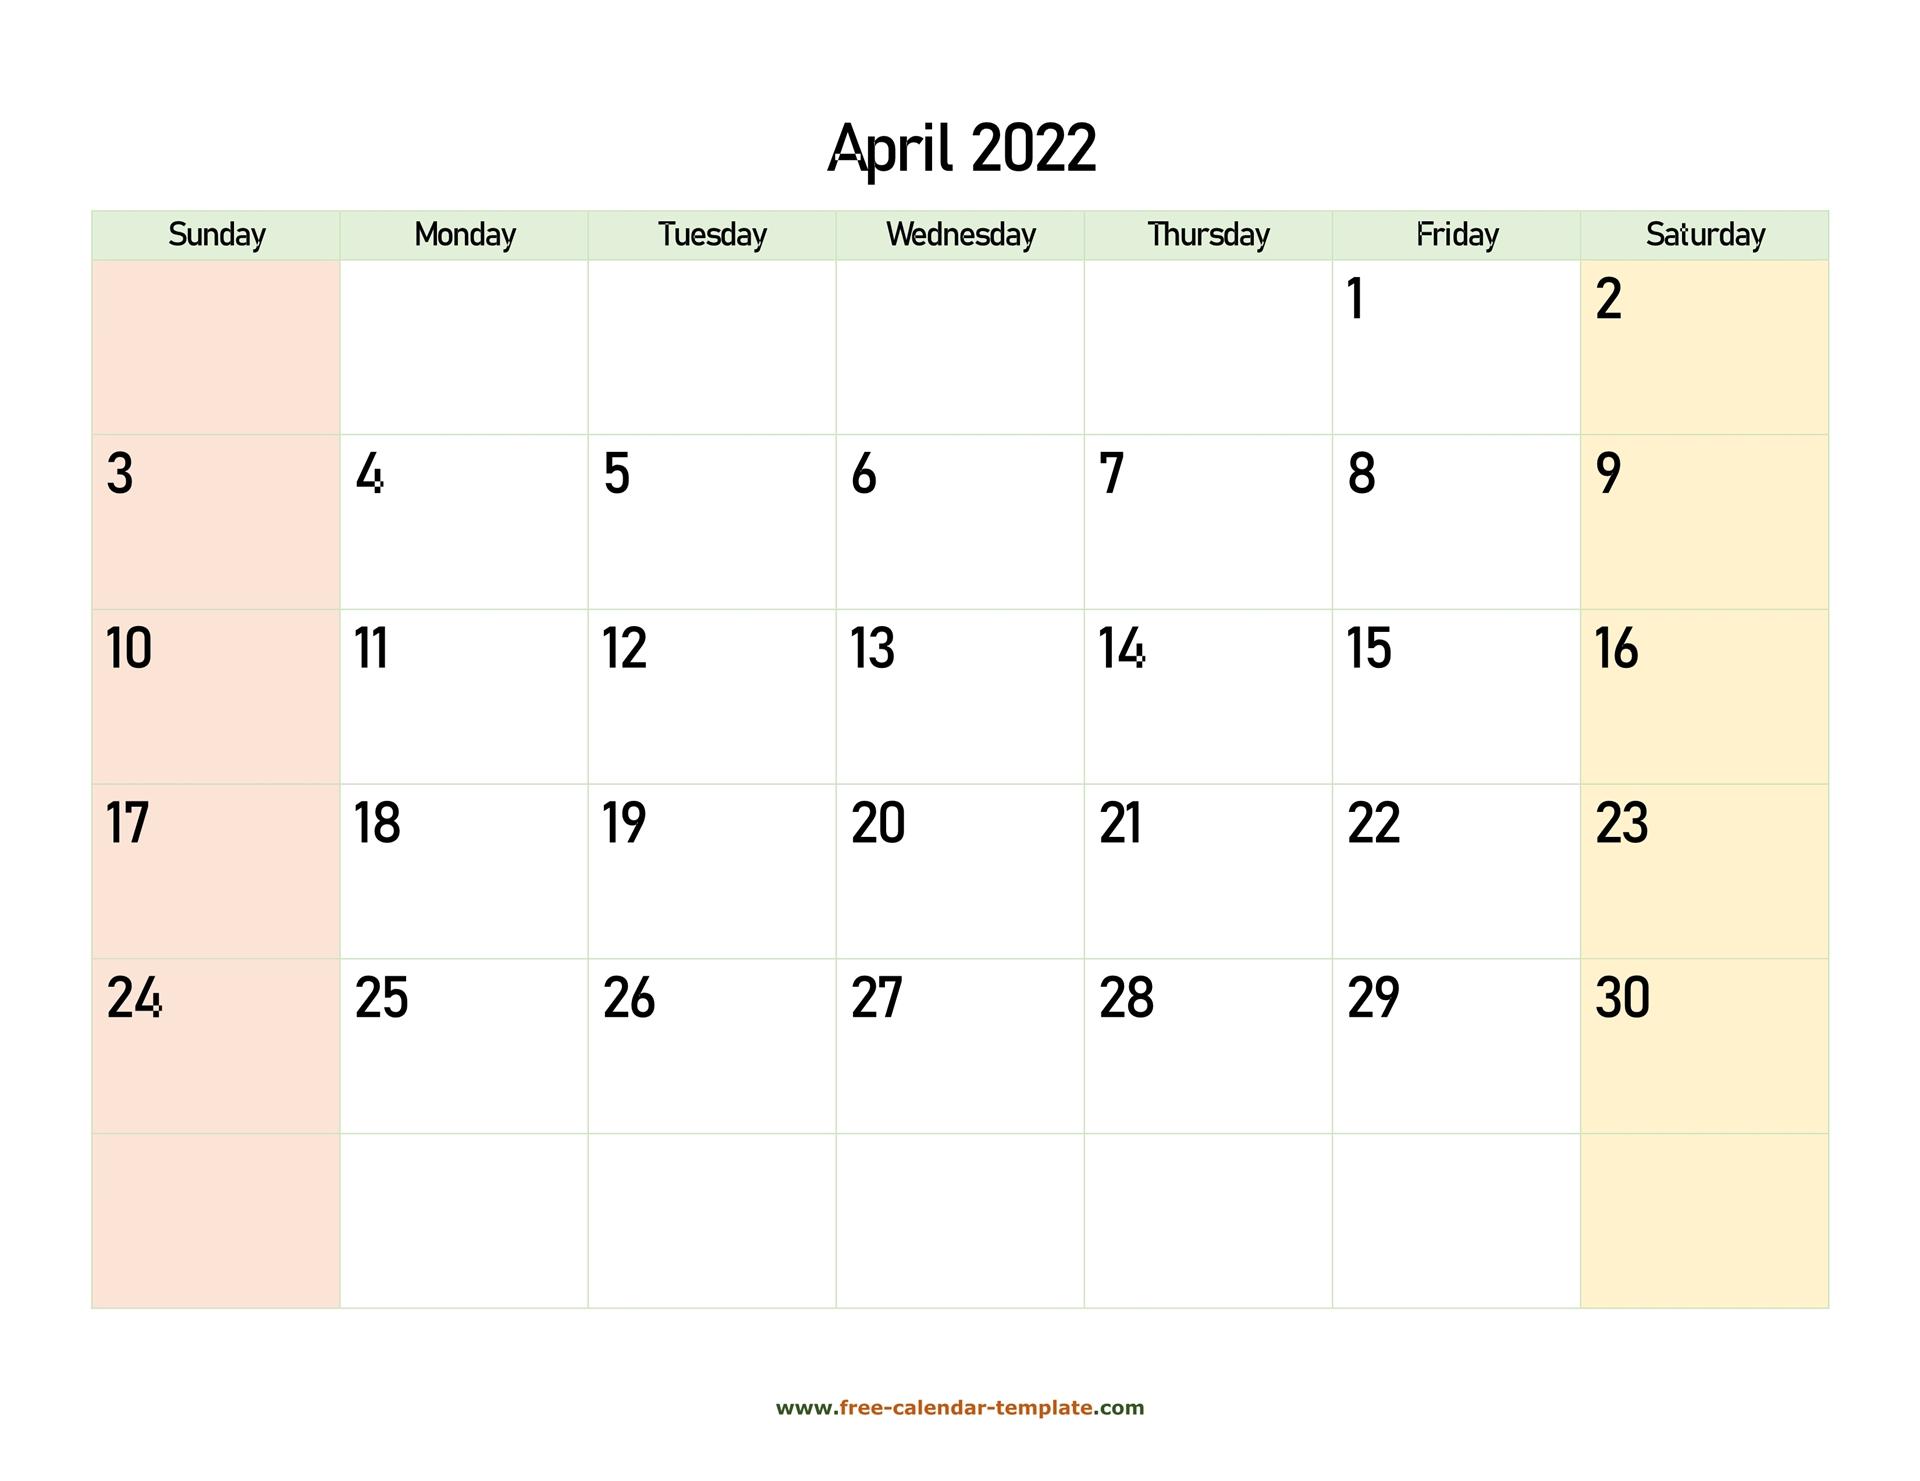 April 2022 Free Calendar Tempplate | Free Calendar Regarding March April 2022 Calendar Free Printable